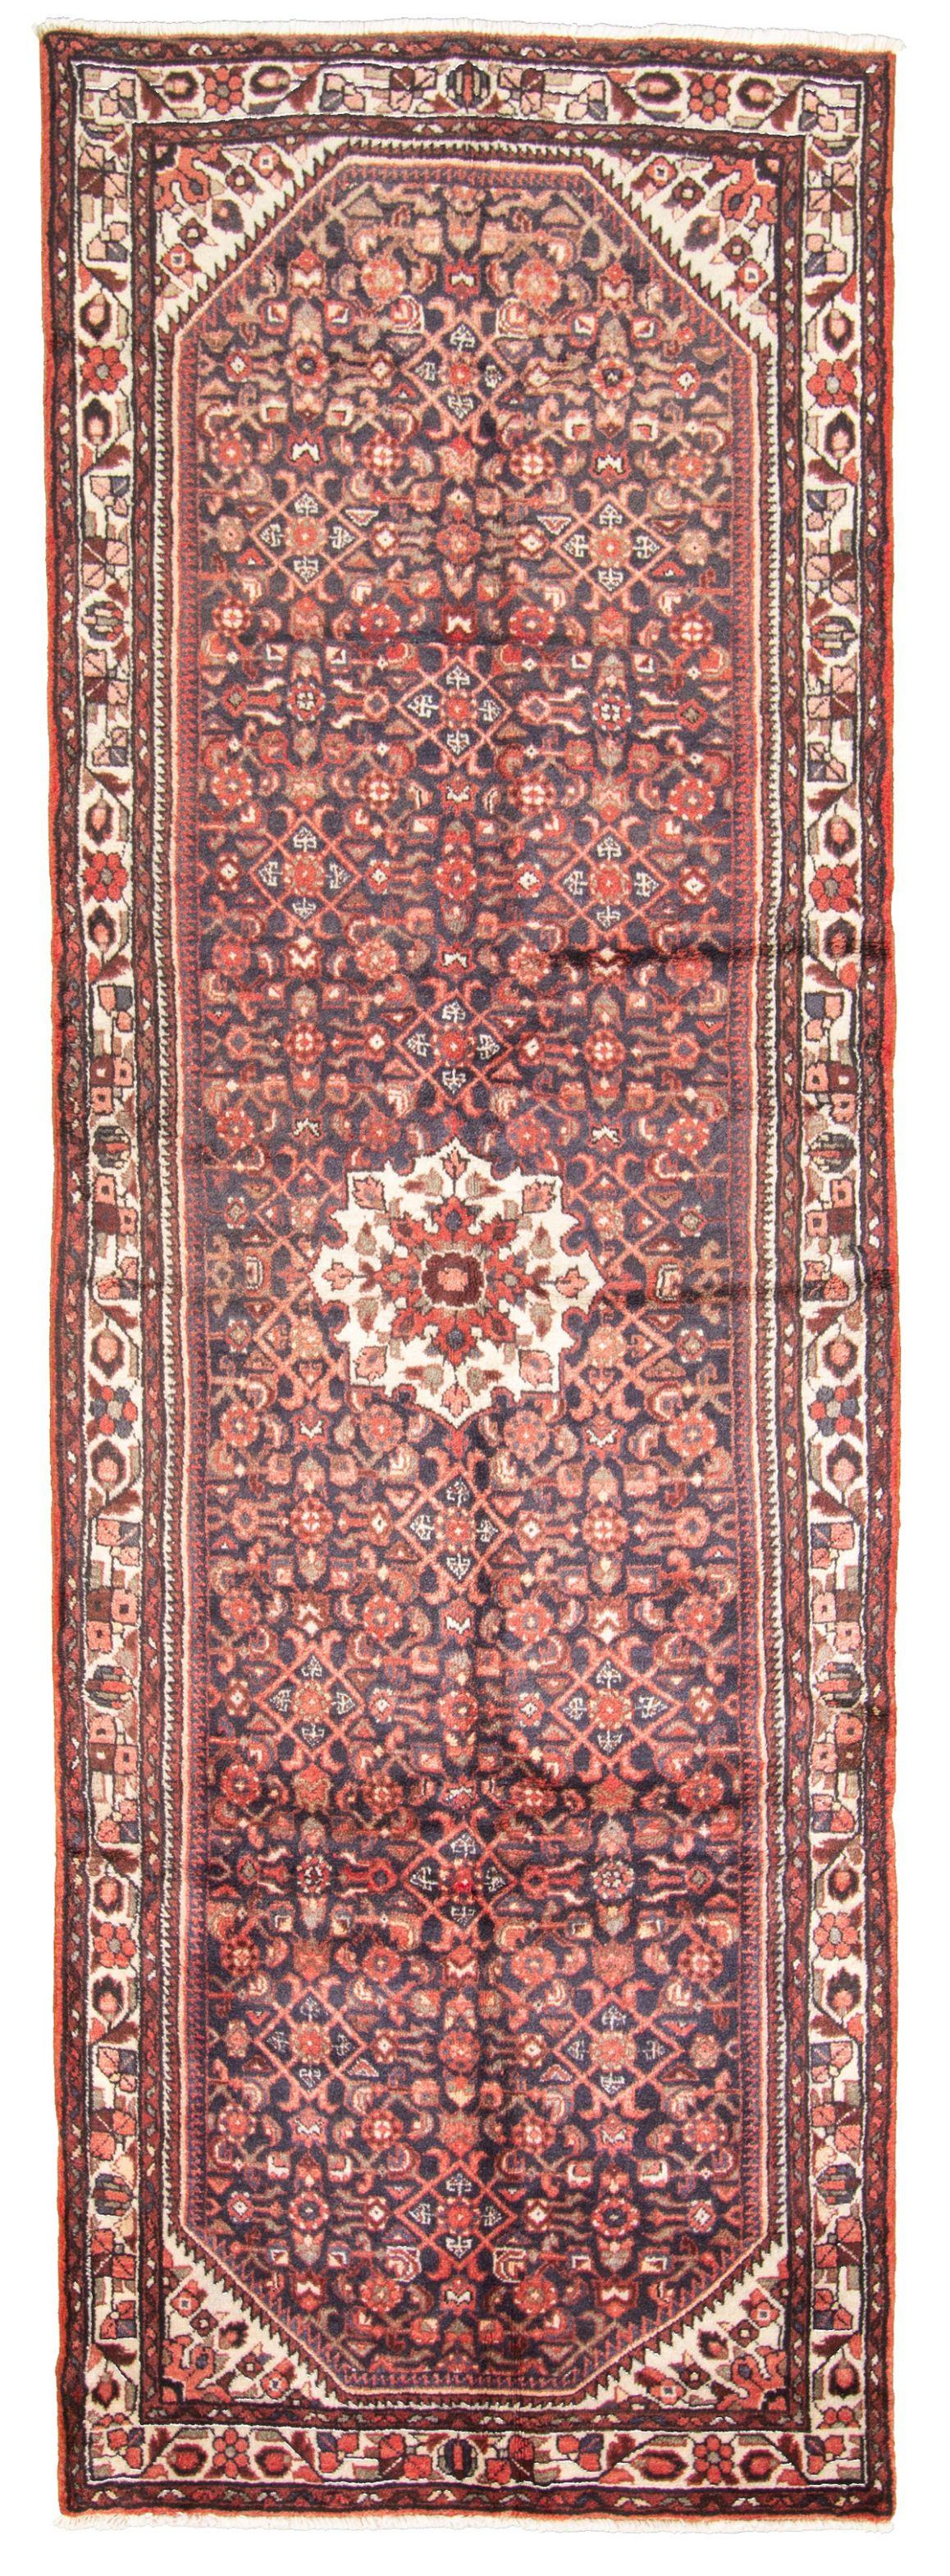 "Hand-knotted Hamadan  Wool Rug 3'9"" x 10'11"" Size: 3'9"" x 10'11"""